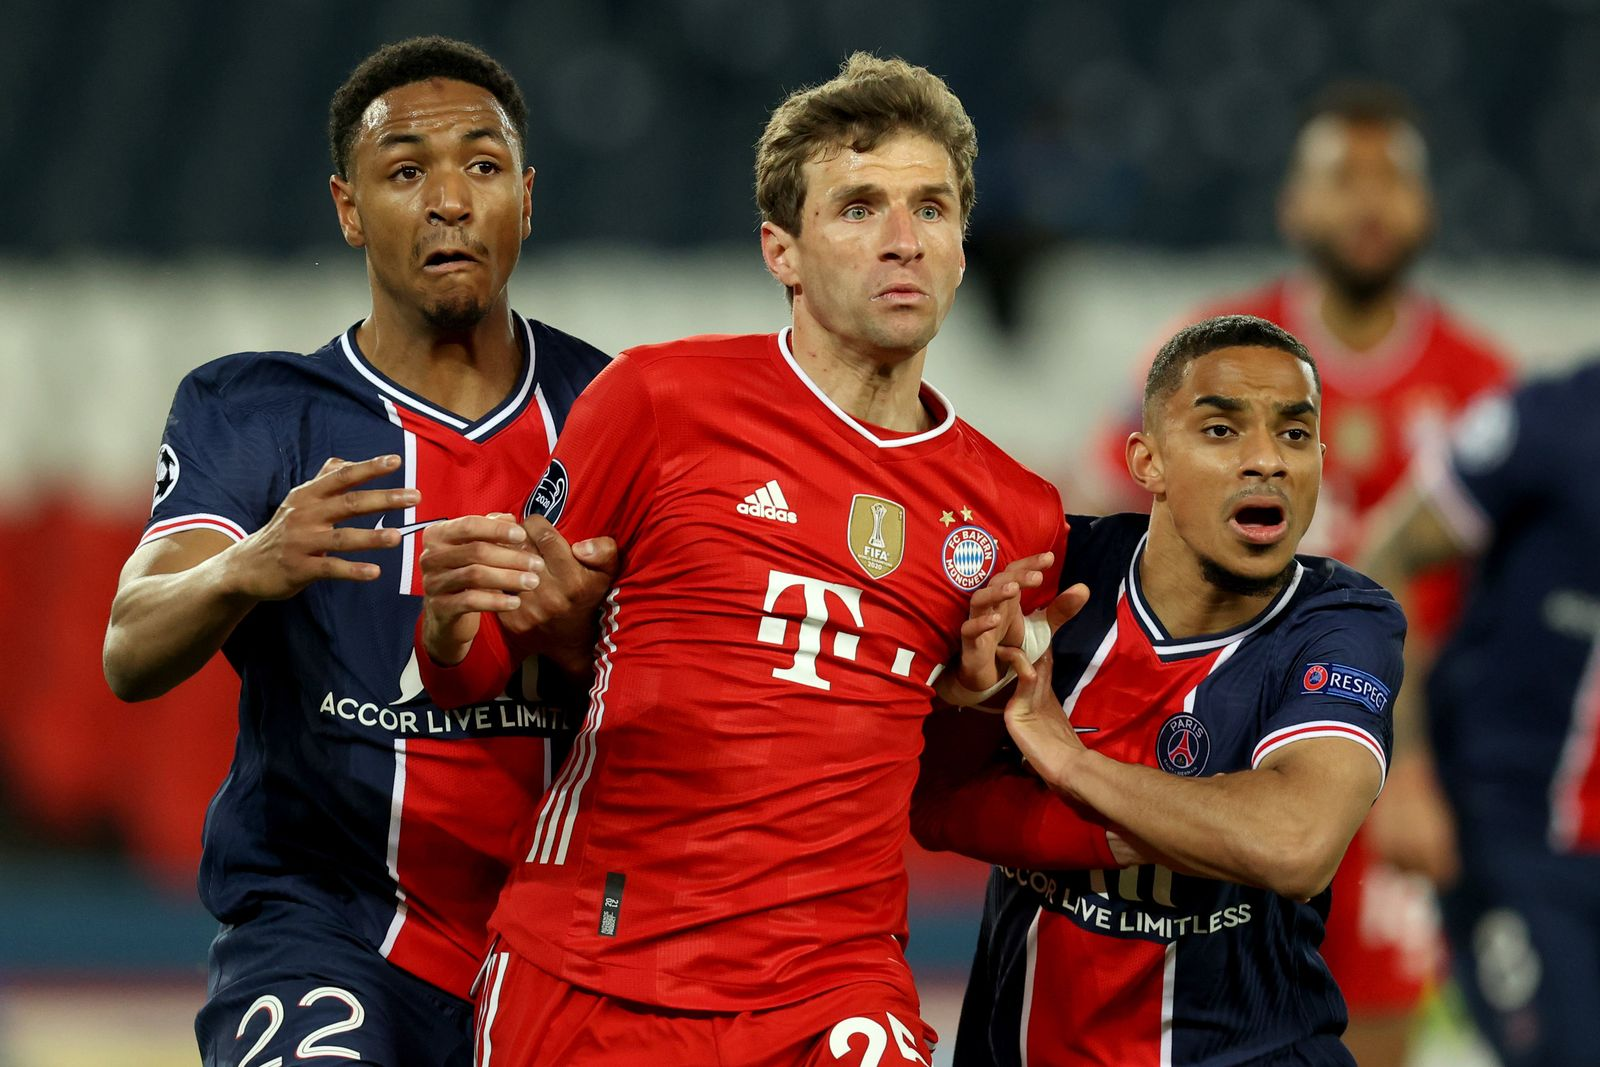 Paris Saint-Germain - FC Bayern München